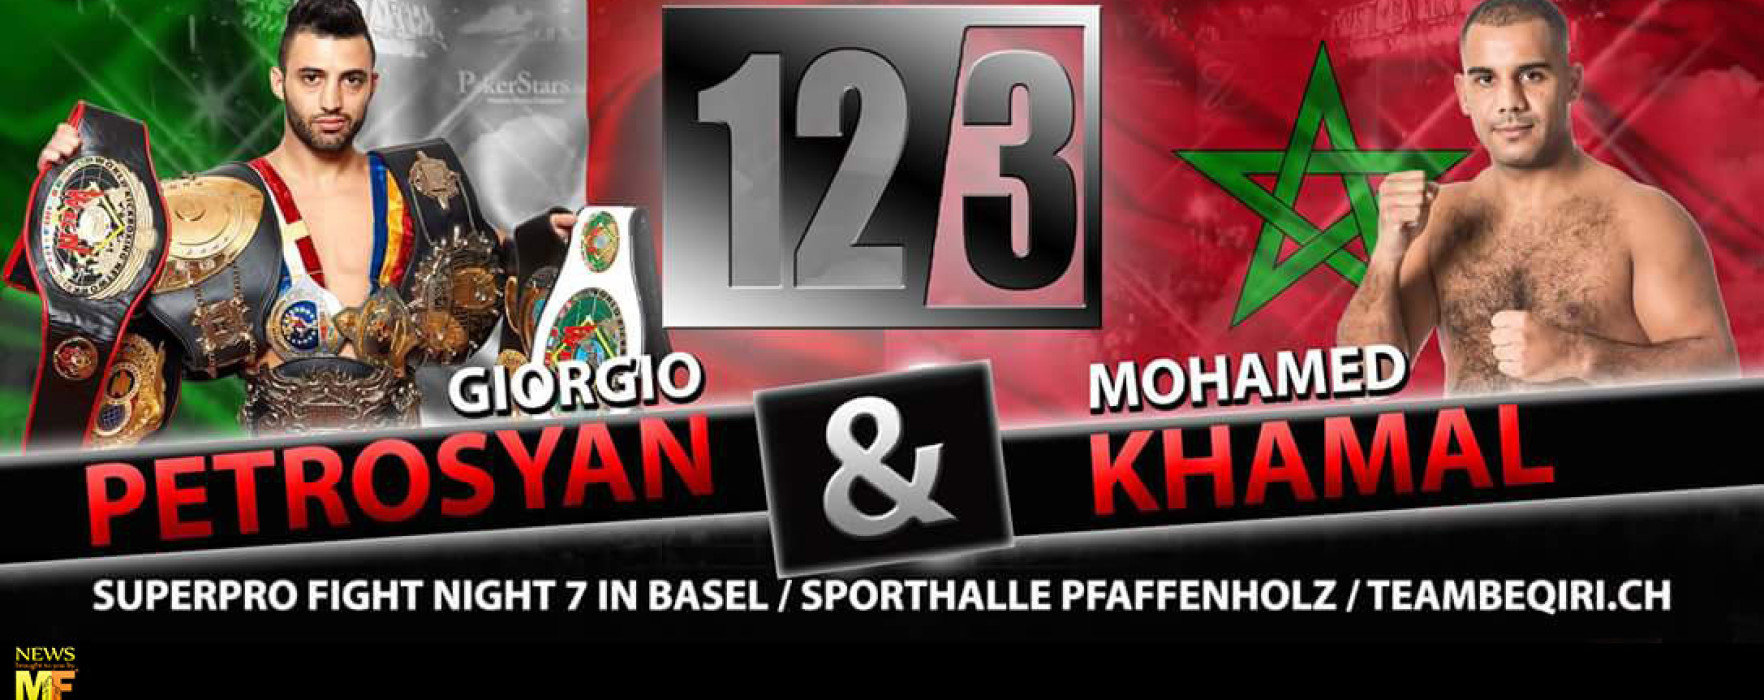 Flash News: Giorgio Petrosyan vs Mohamed Khamal – SuperPro Fight Night 7 – Basel – 12/03/2016